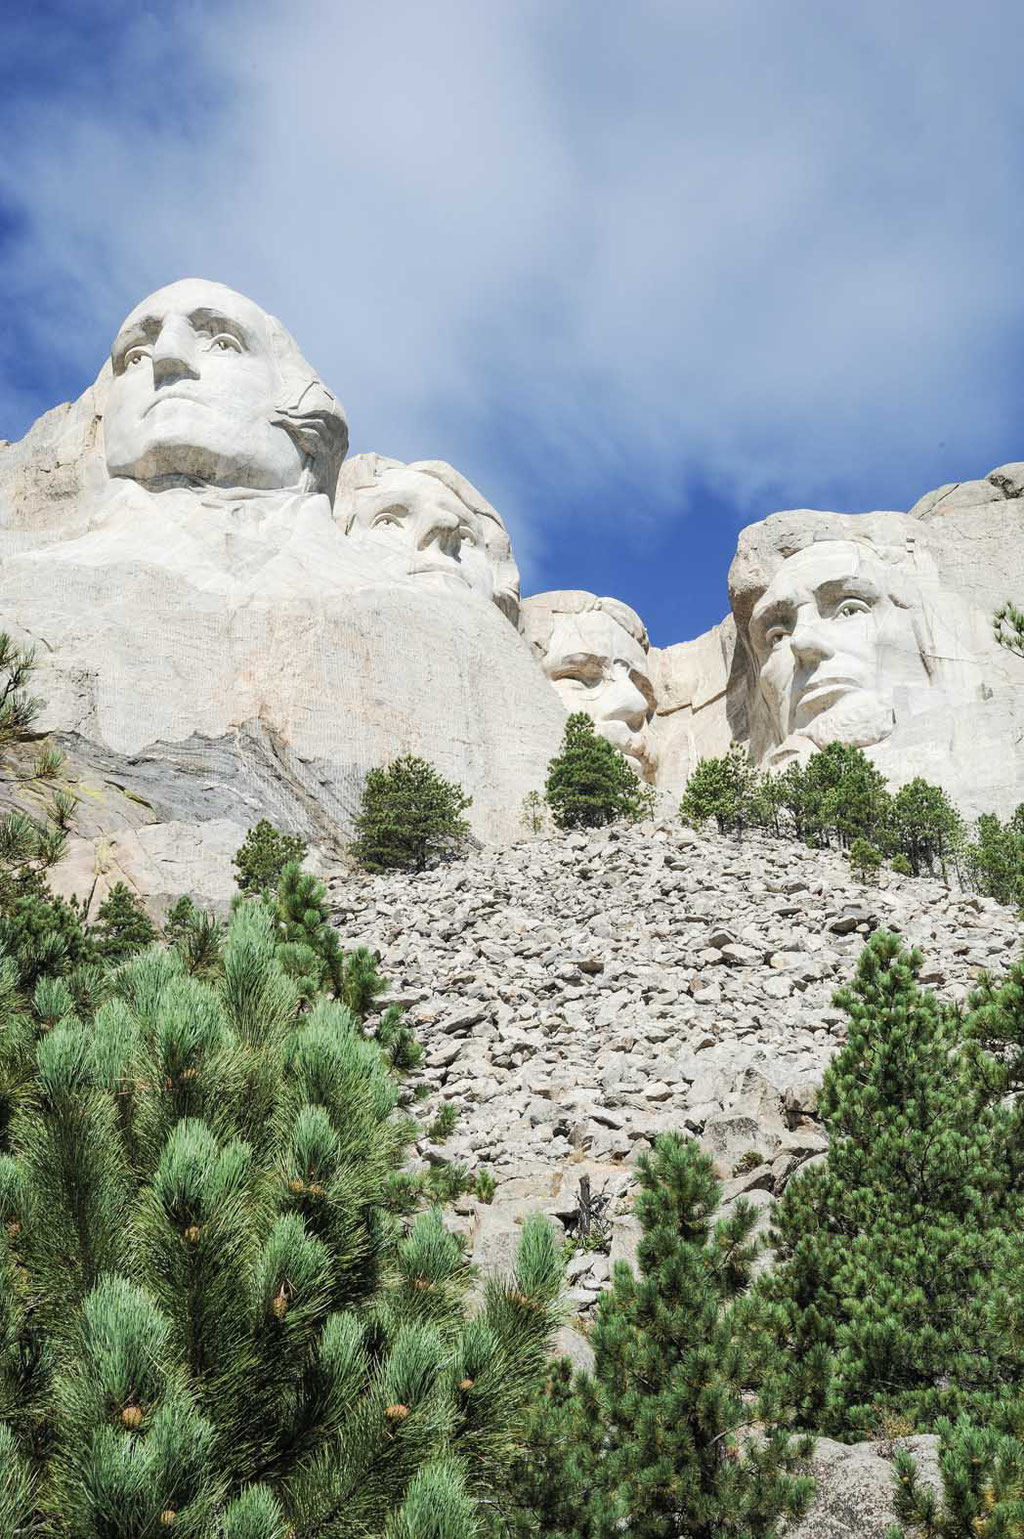 Mount Rushmore, Keystone, South Dakota (USA)